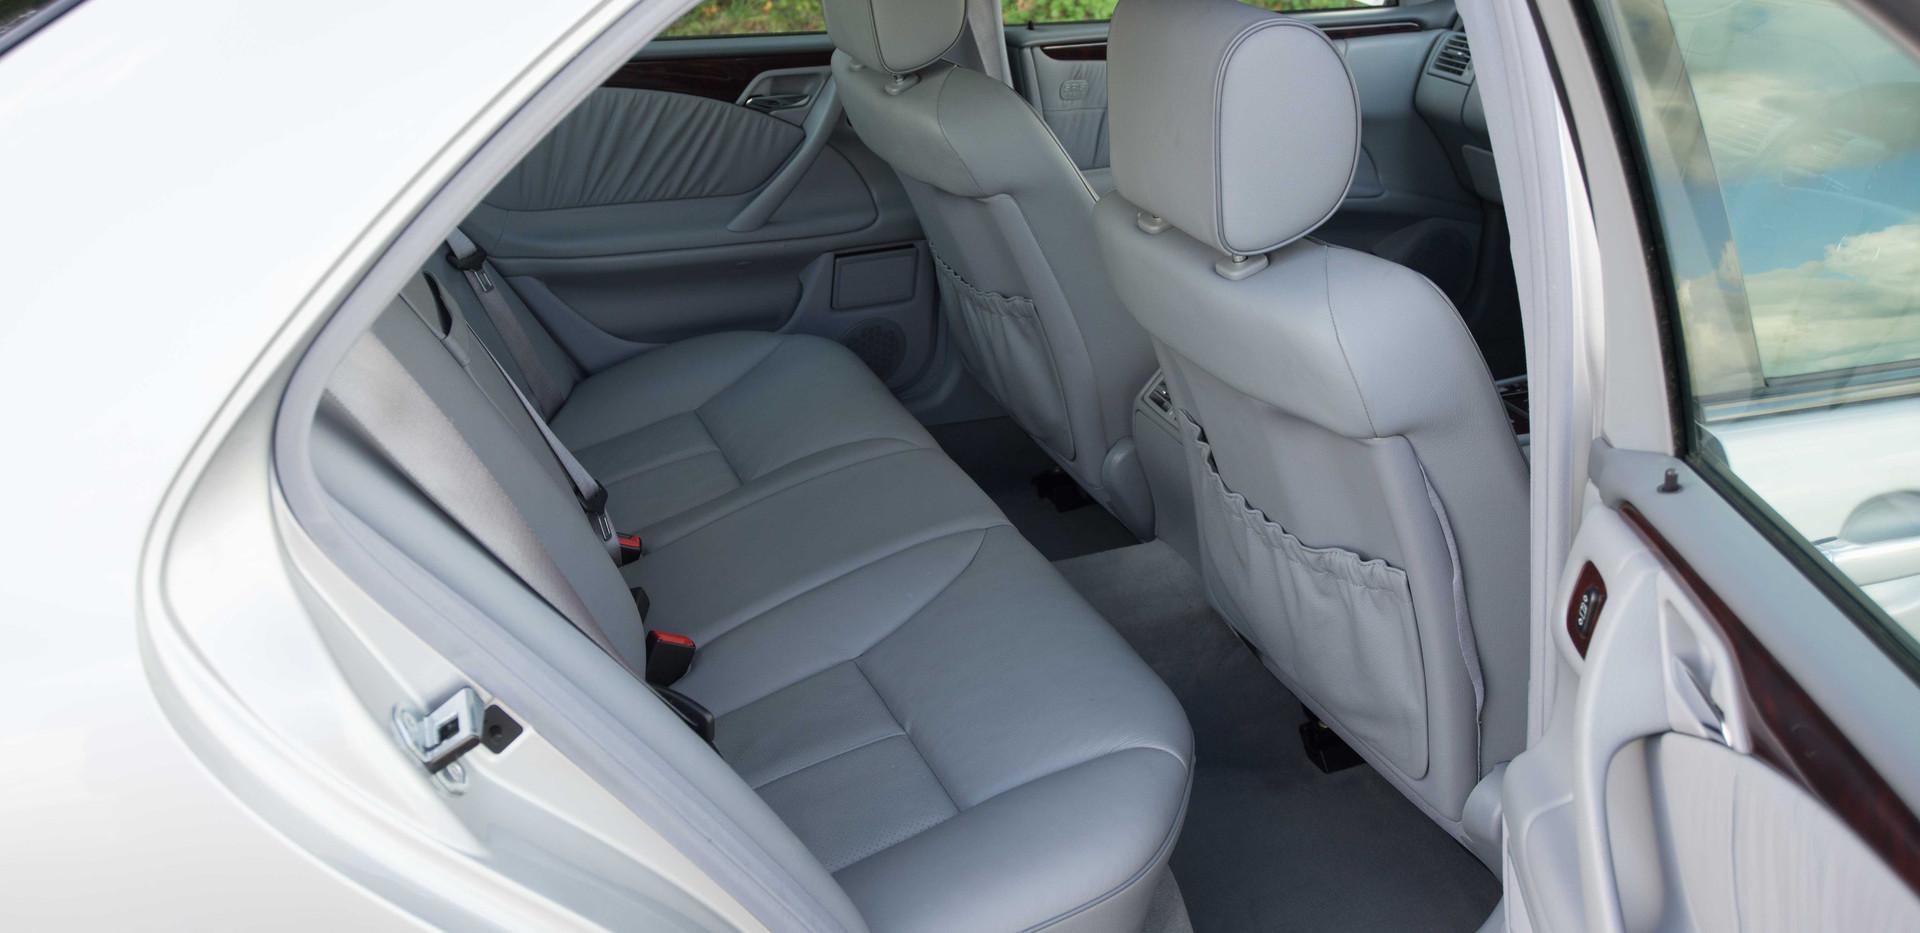 Mercedes E240 For Sale UK London  (50 of